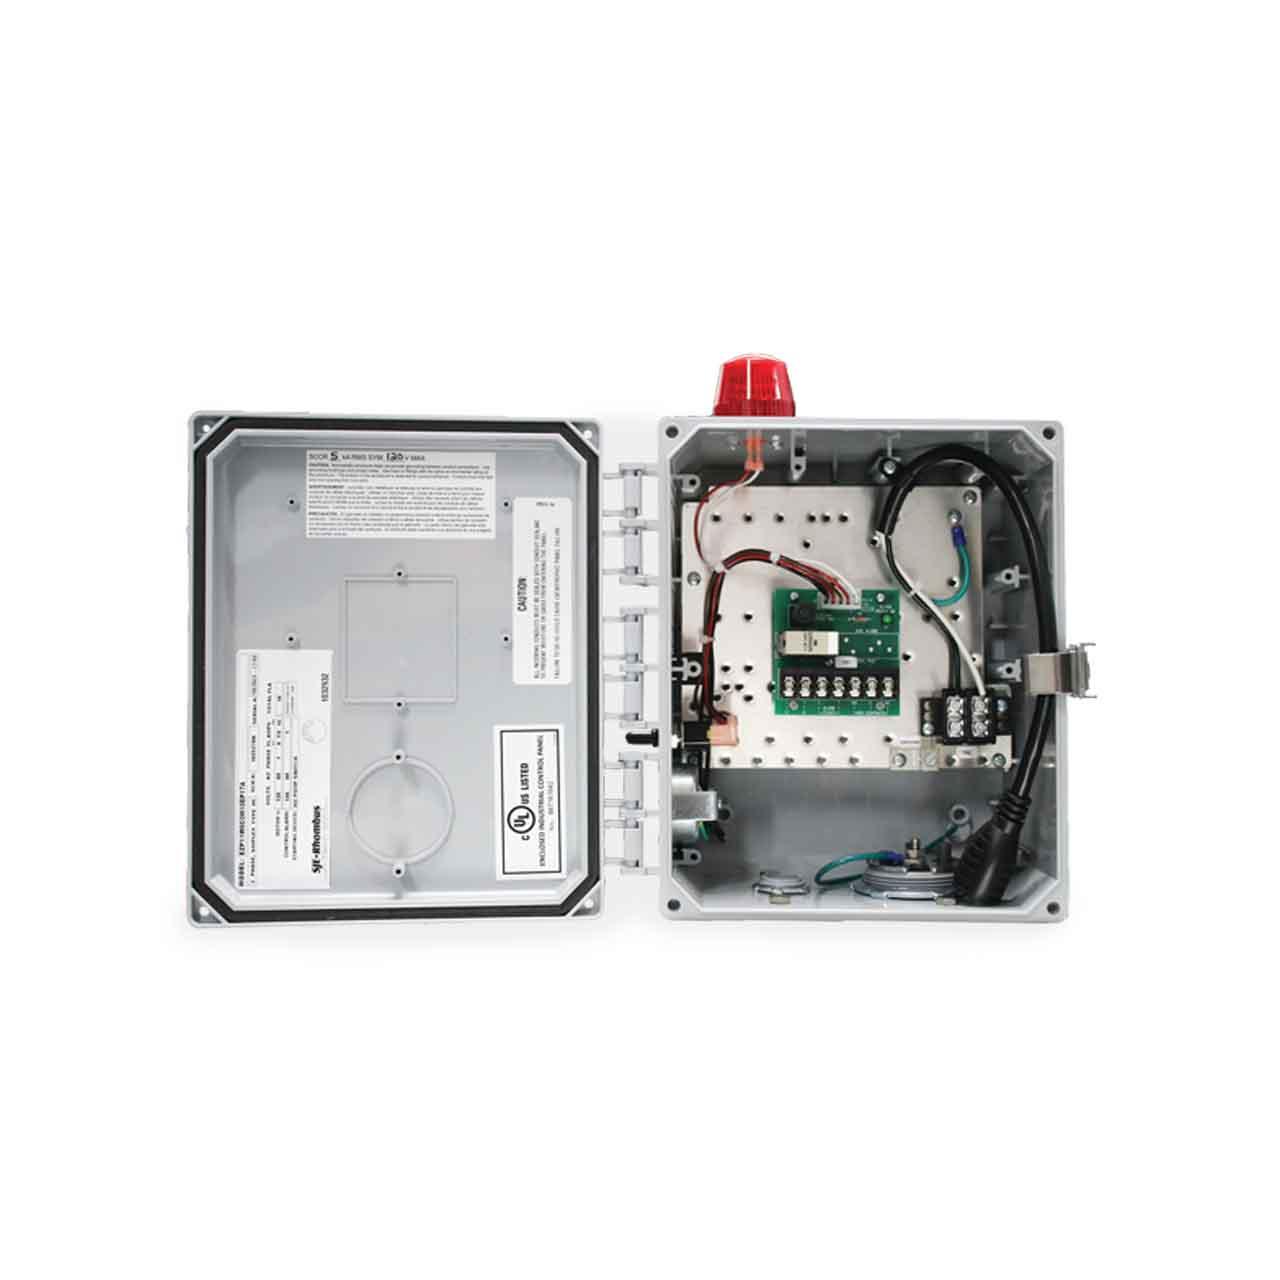 Rhombus Septic Control Wiring Diagram Automotive Tank Sje Ez Series Plugger Plug In Pump Rh Rcworst Com